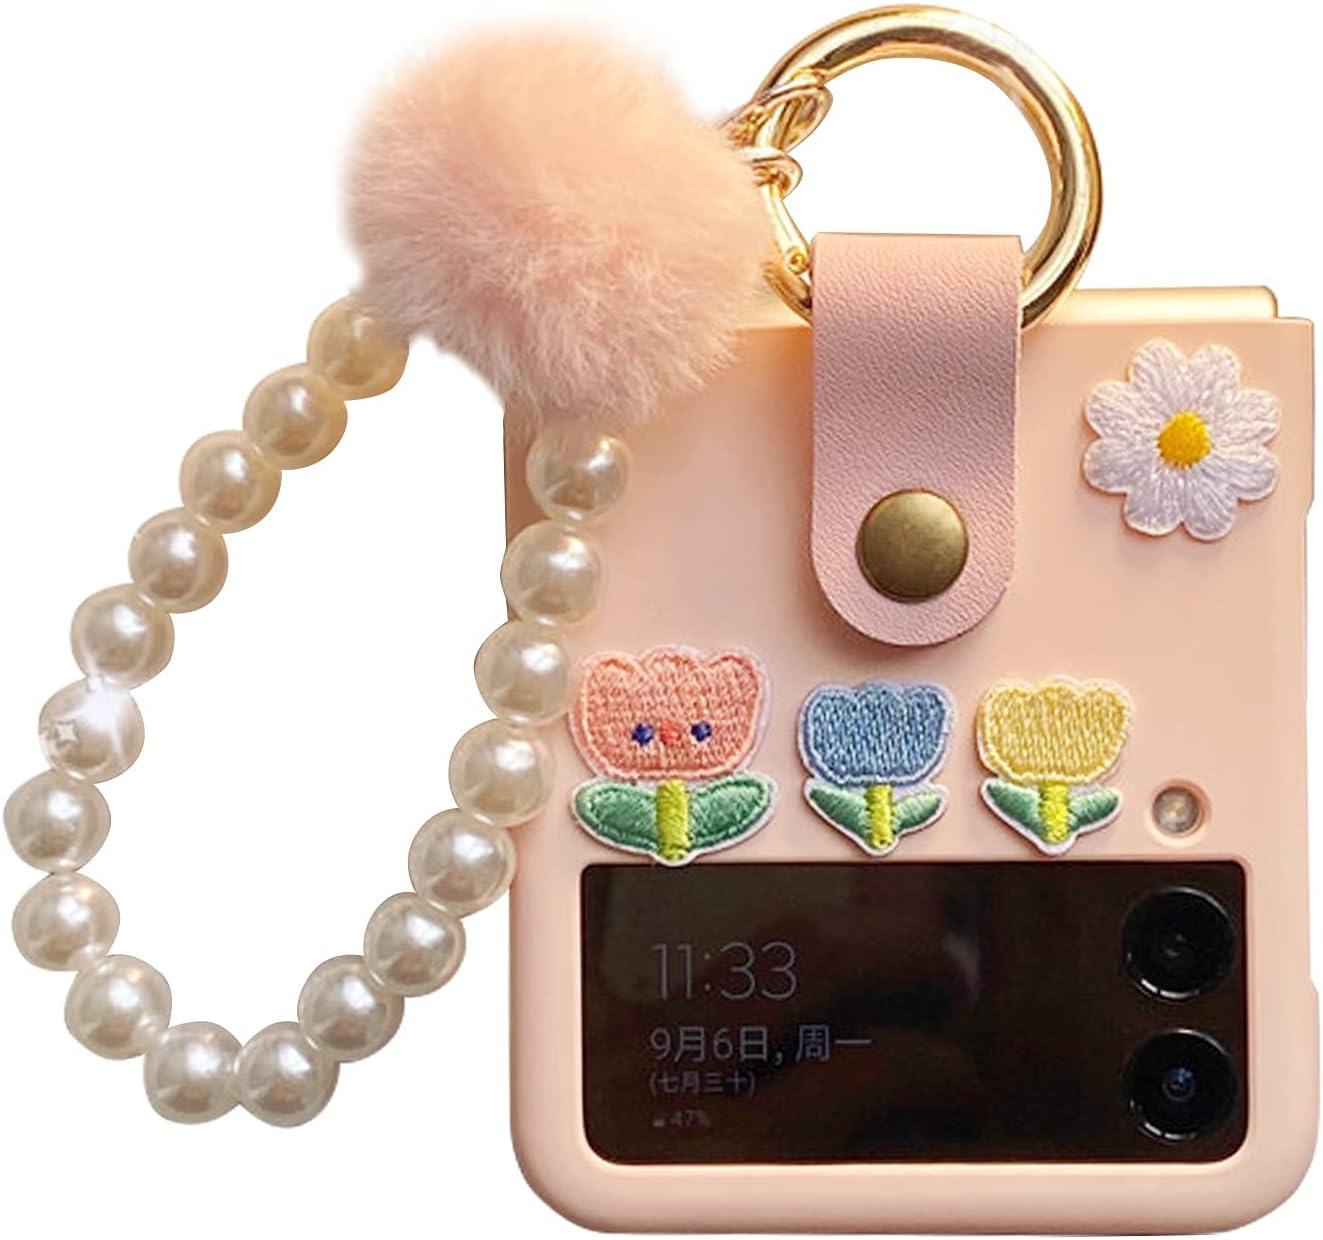 Samsung Galaxy Z Flip 3 Case, Cute Galaxy Z Flip 3 Pink Case with Ring & Shockproof Non-Slip Protective Designed for Samsung Z Flip 3 5G Case 2021